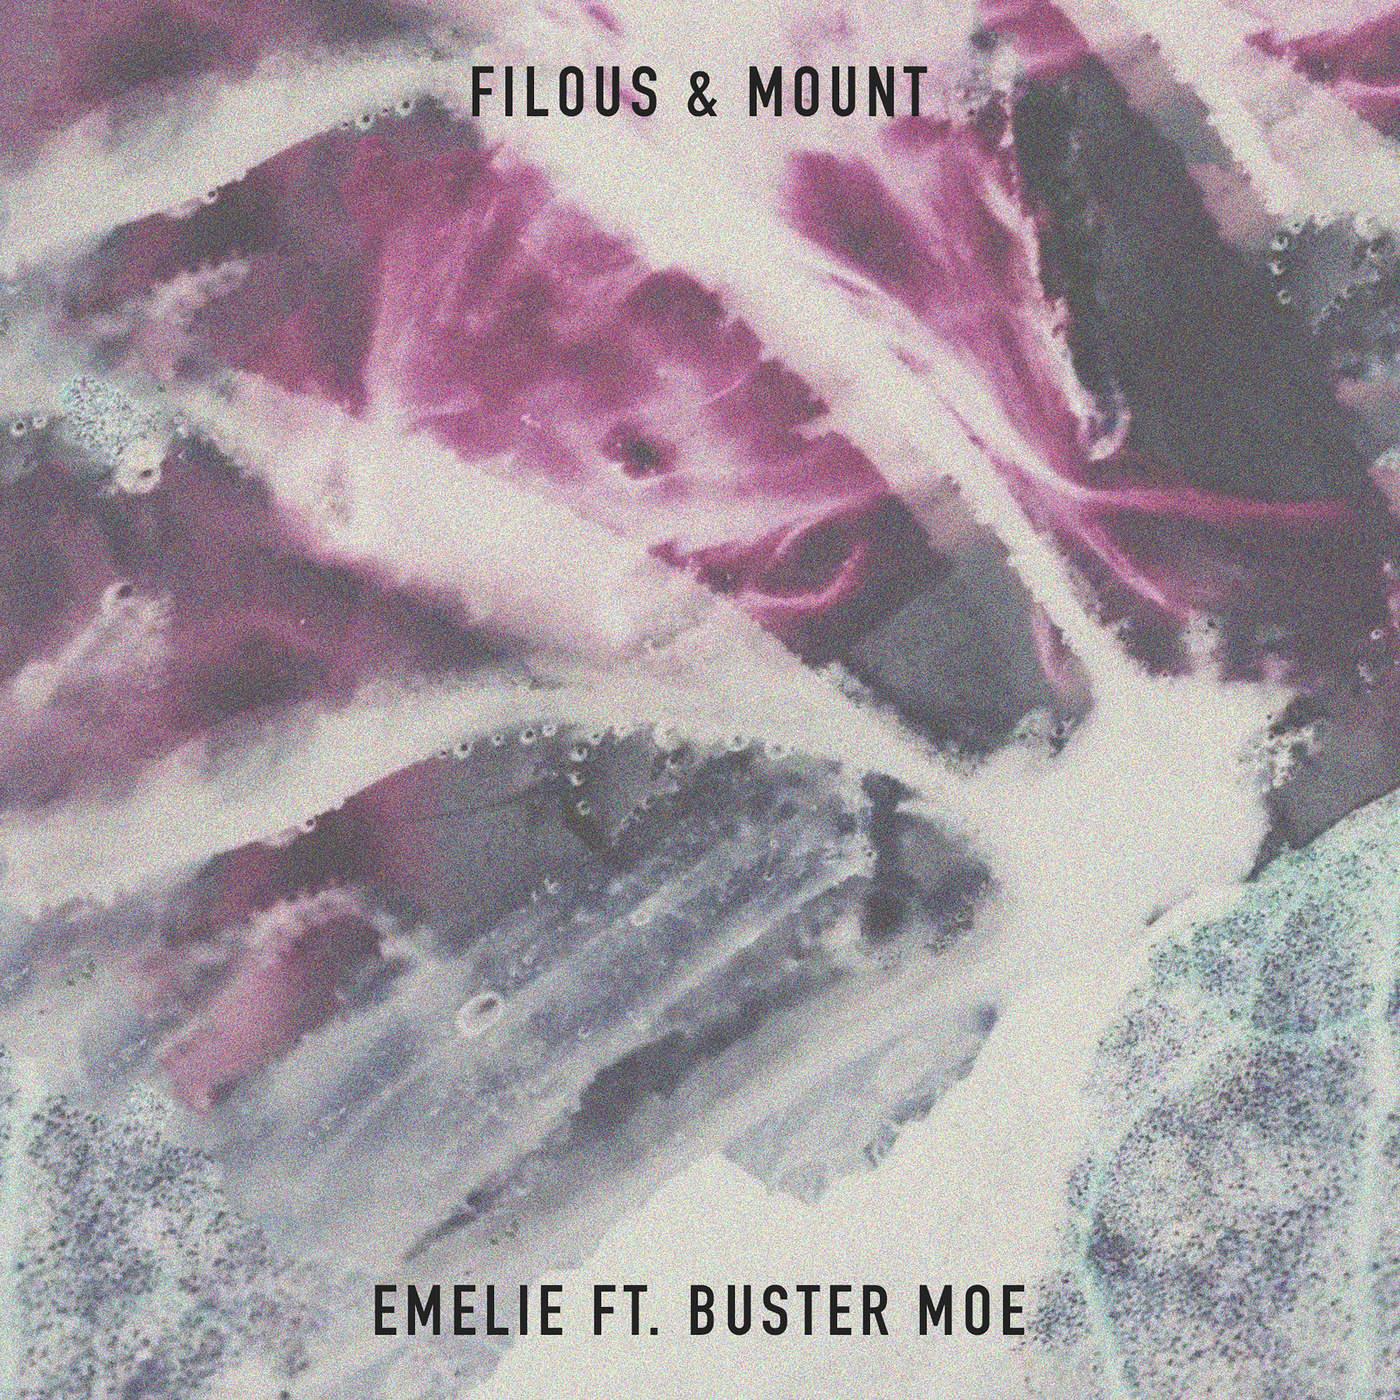 Filous & MOUNT - Emelie (feat. Buster Moe) [Radio Edit] - Single Cover